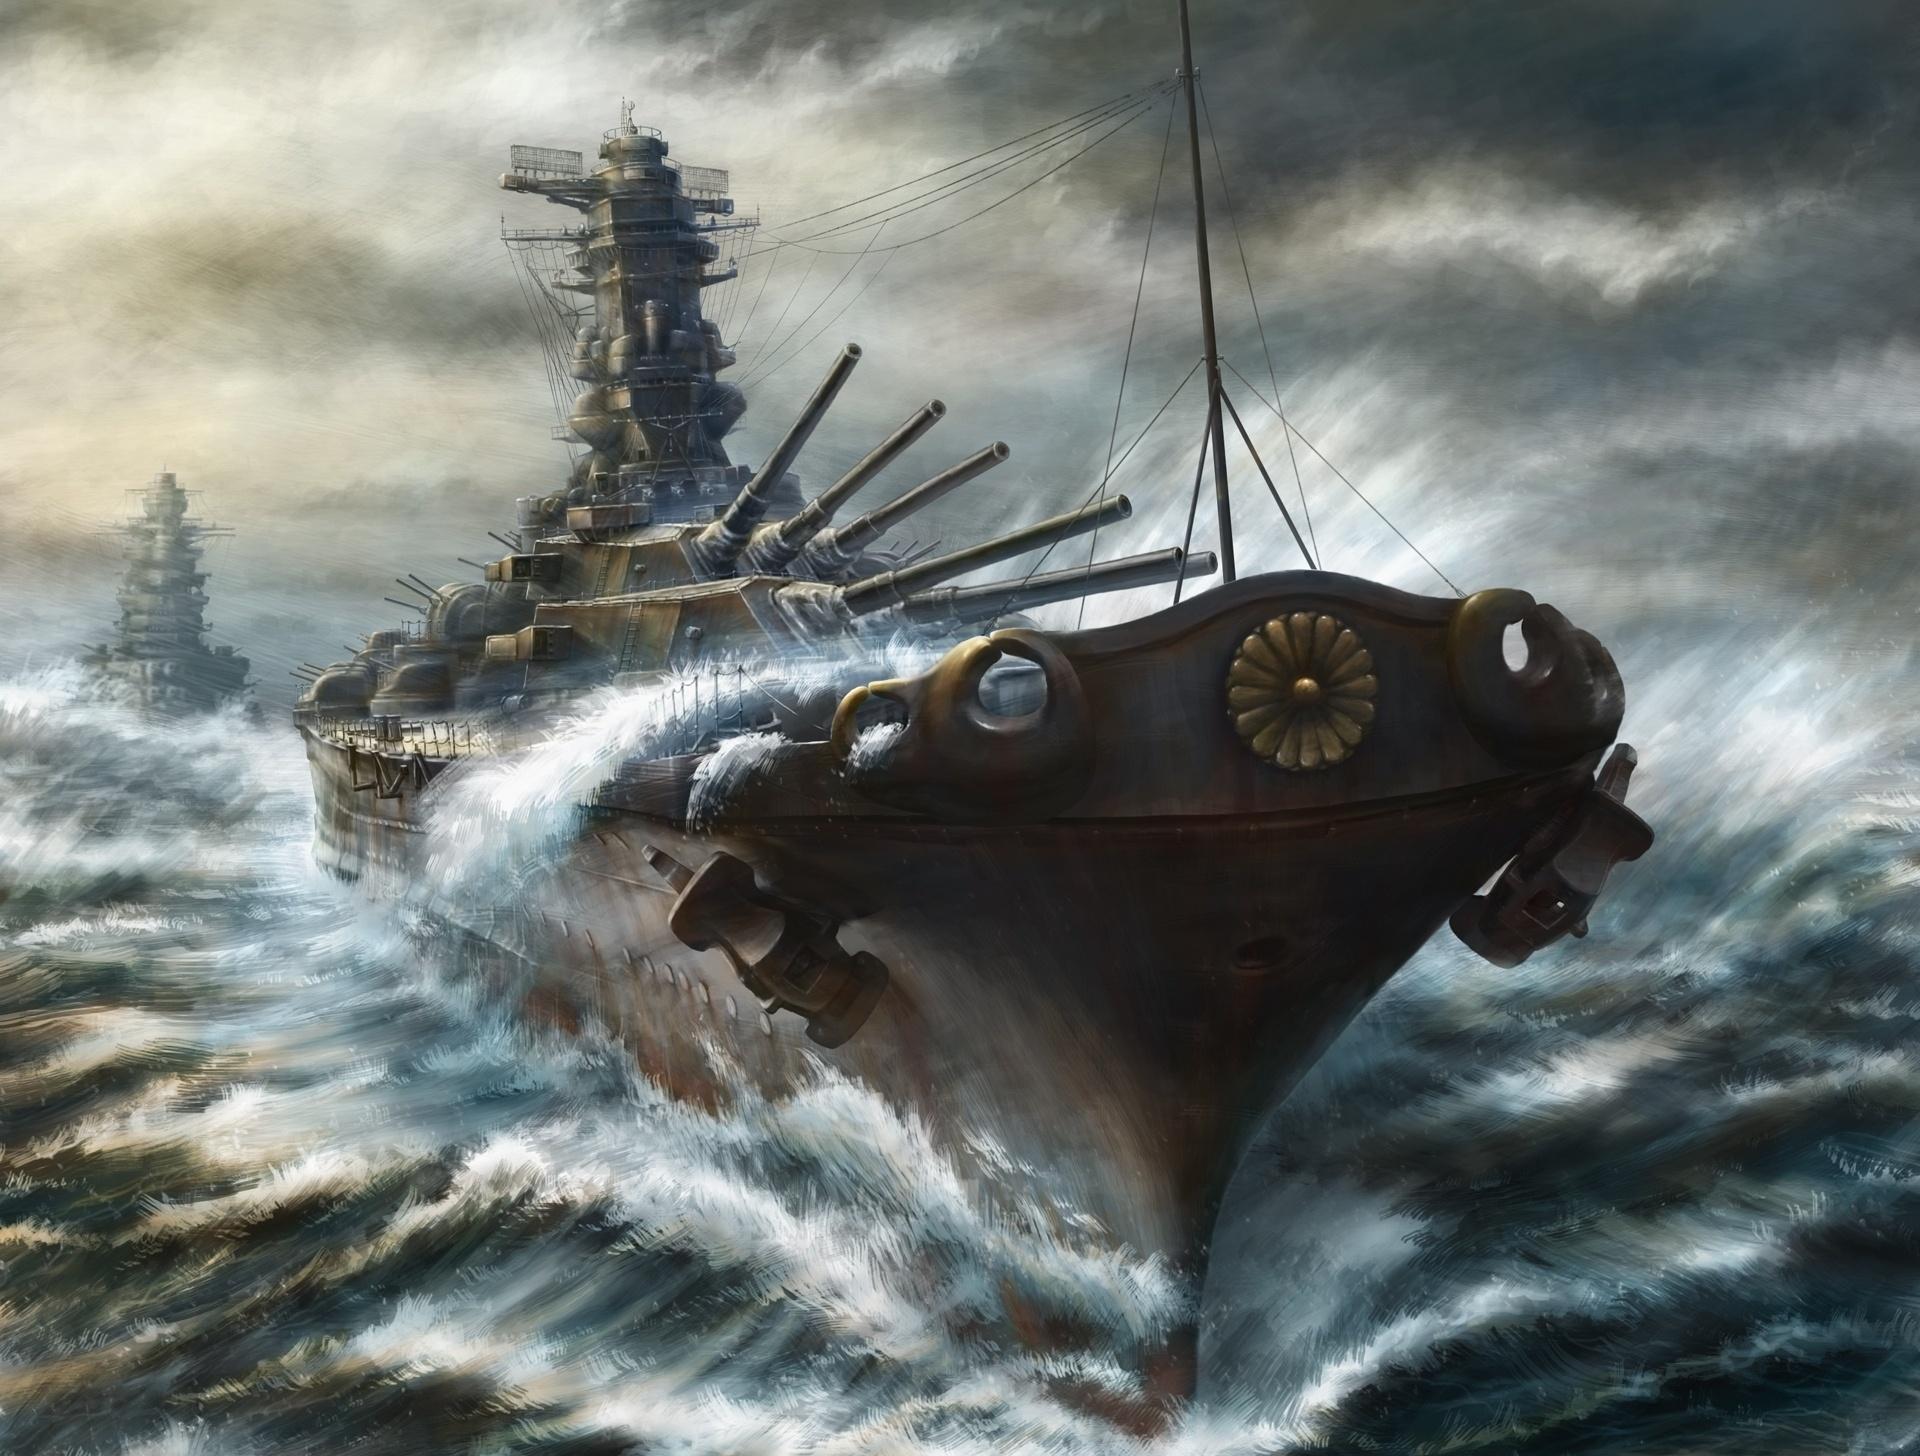 takahisa ships cruiser battleship art military wallpaper background 1920x1456